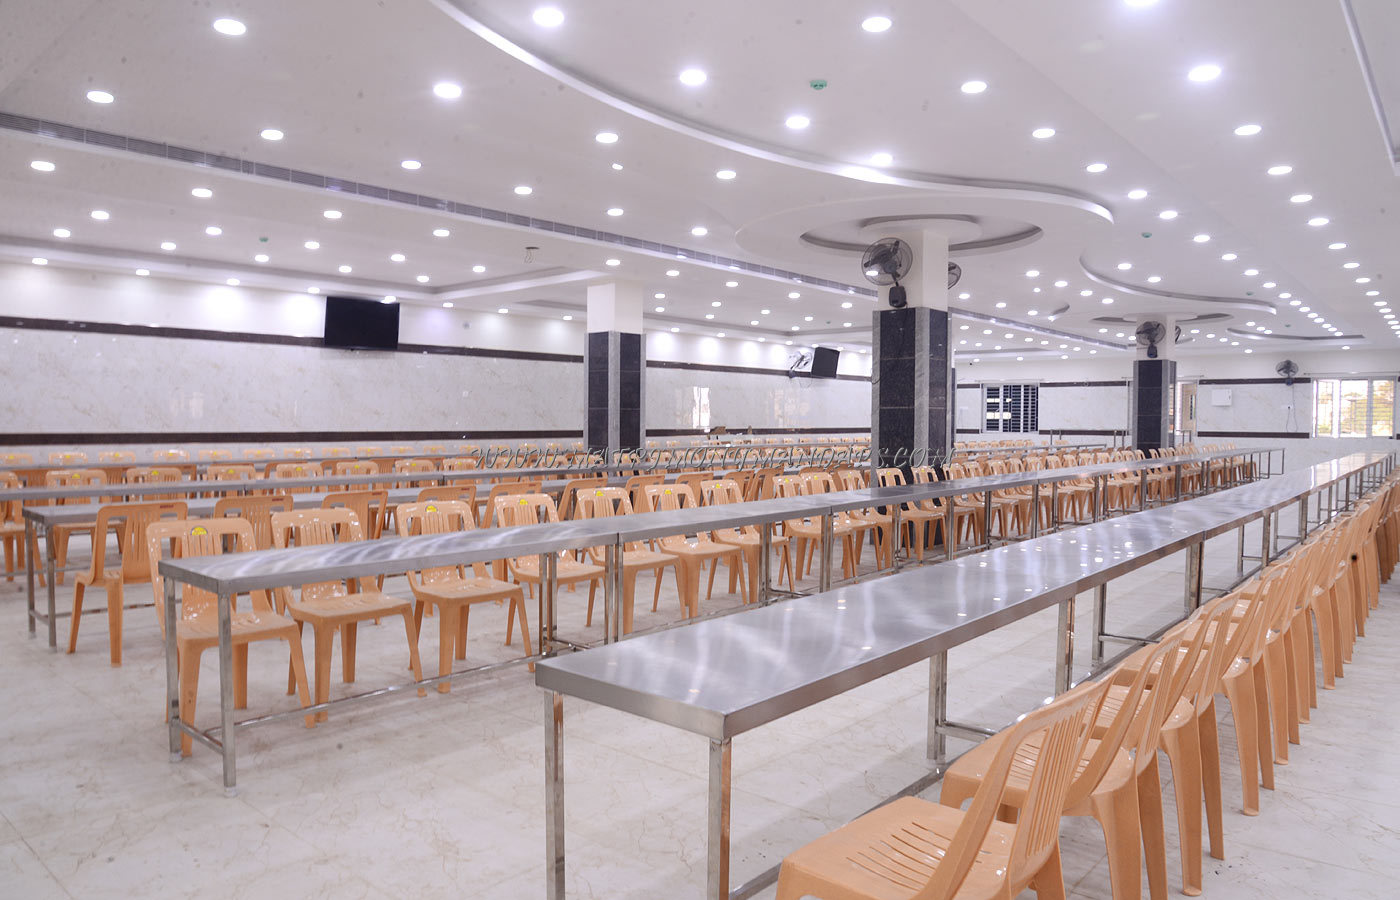 Arularasan Palace - Dining Hall